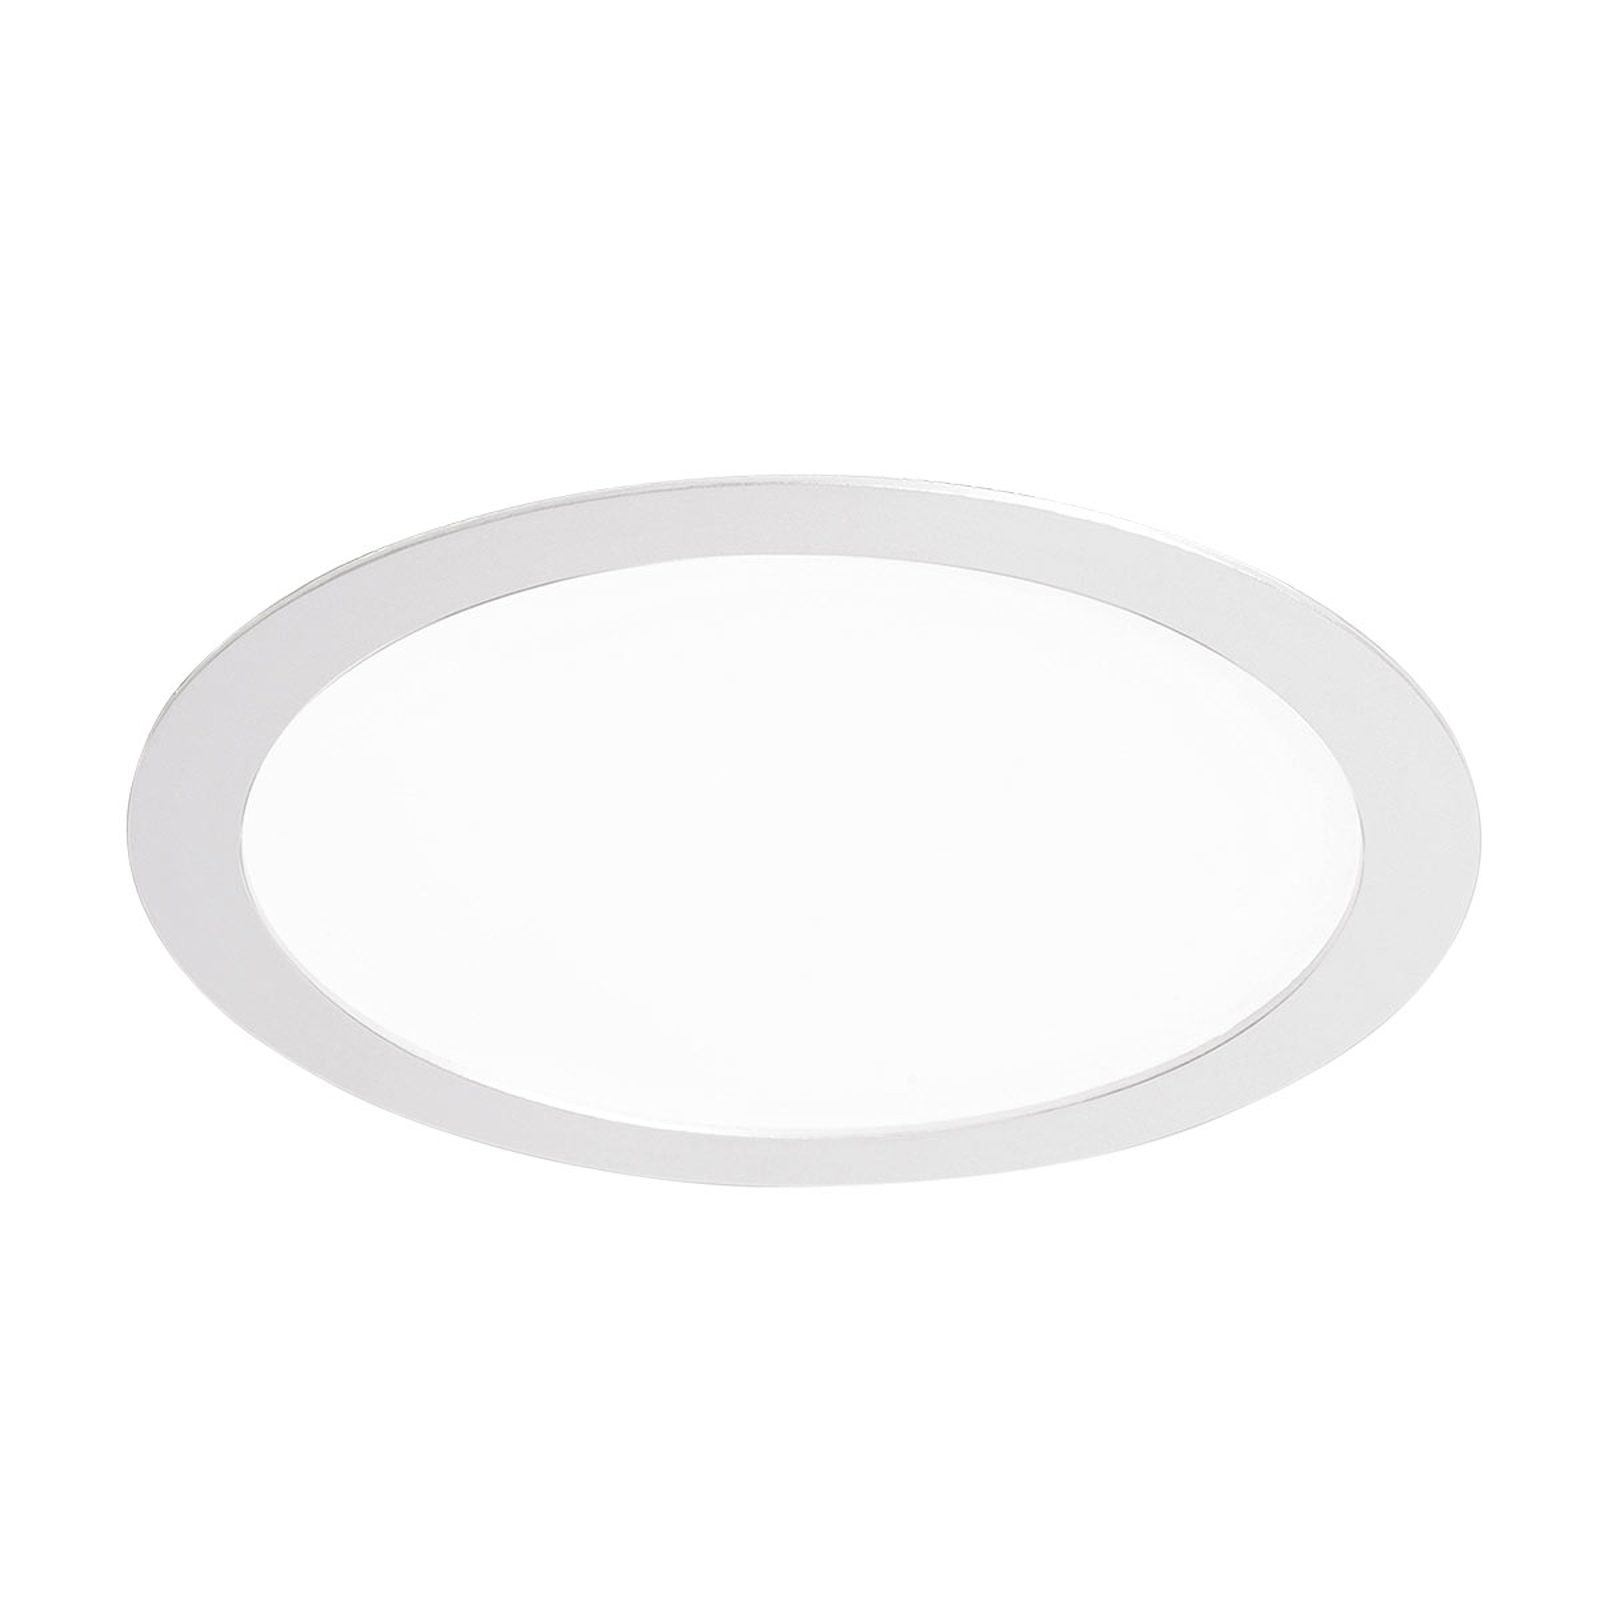 Moon Round LED-downlight 12W, 4 000 K